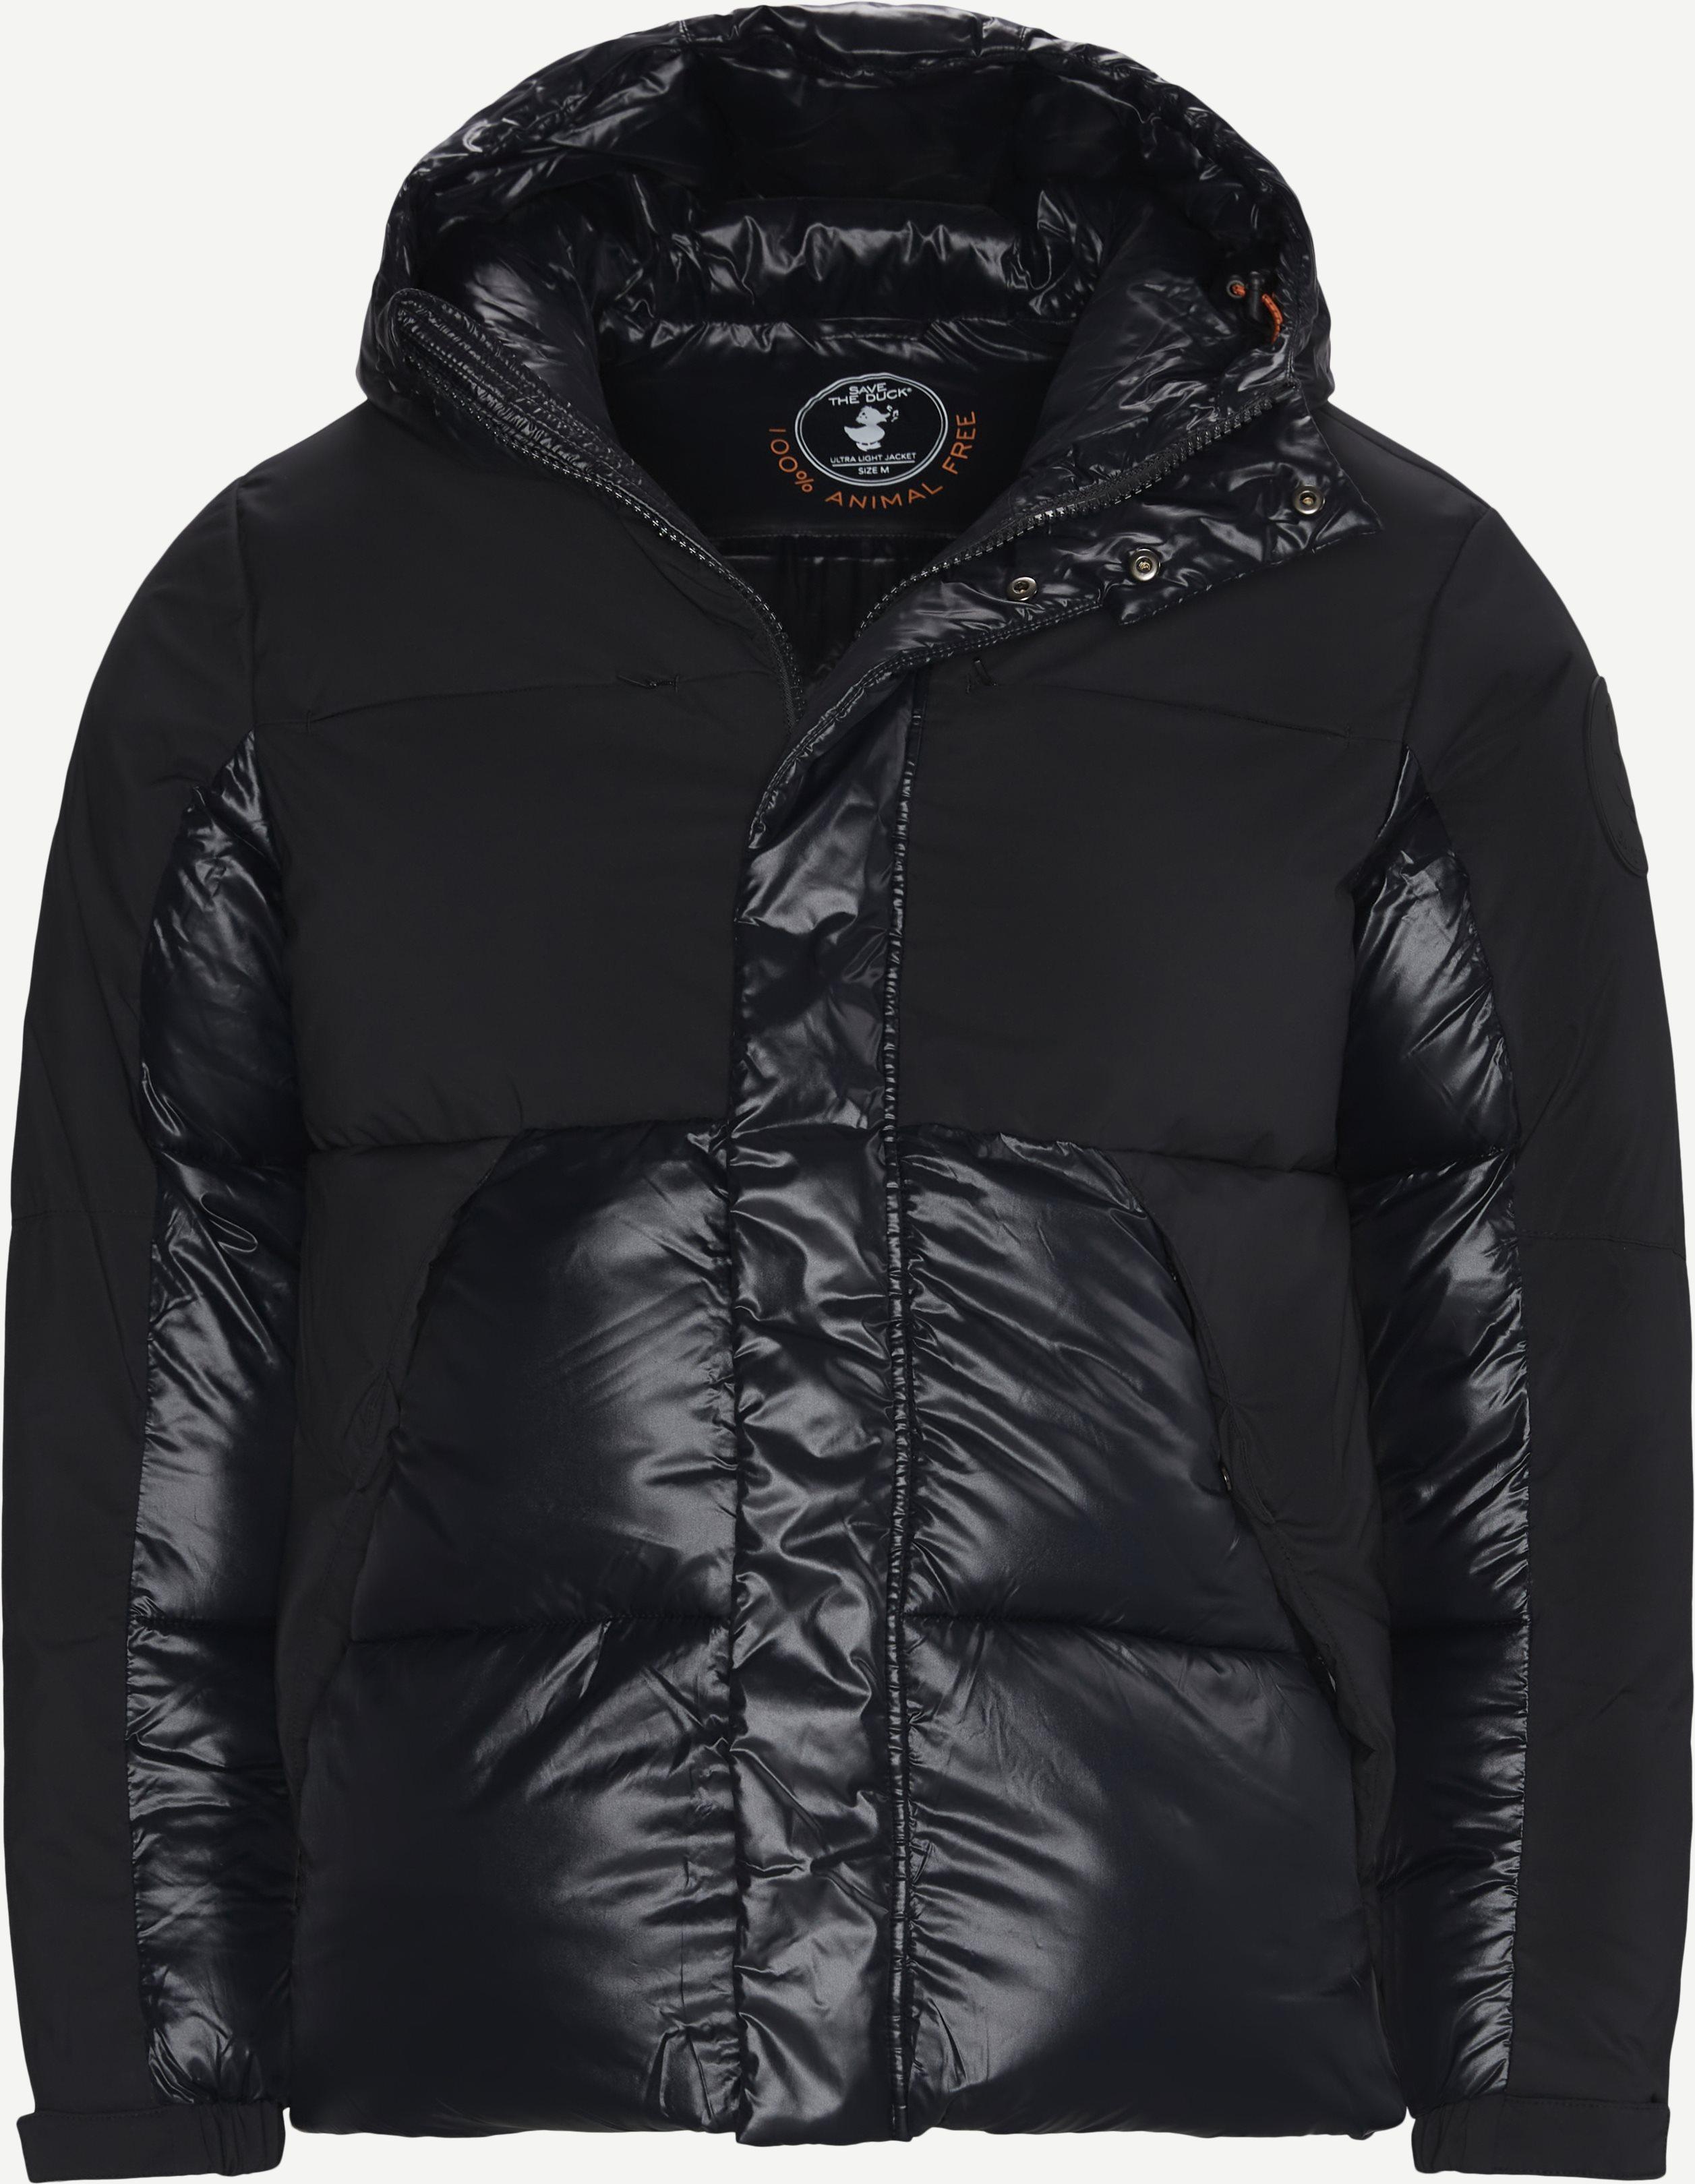 Lumay Jacket - Jackor - Regular - Svart